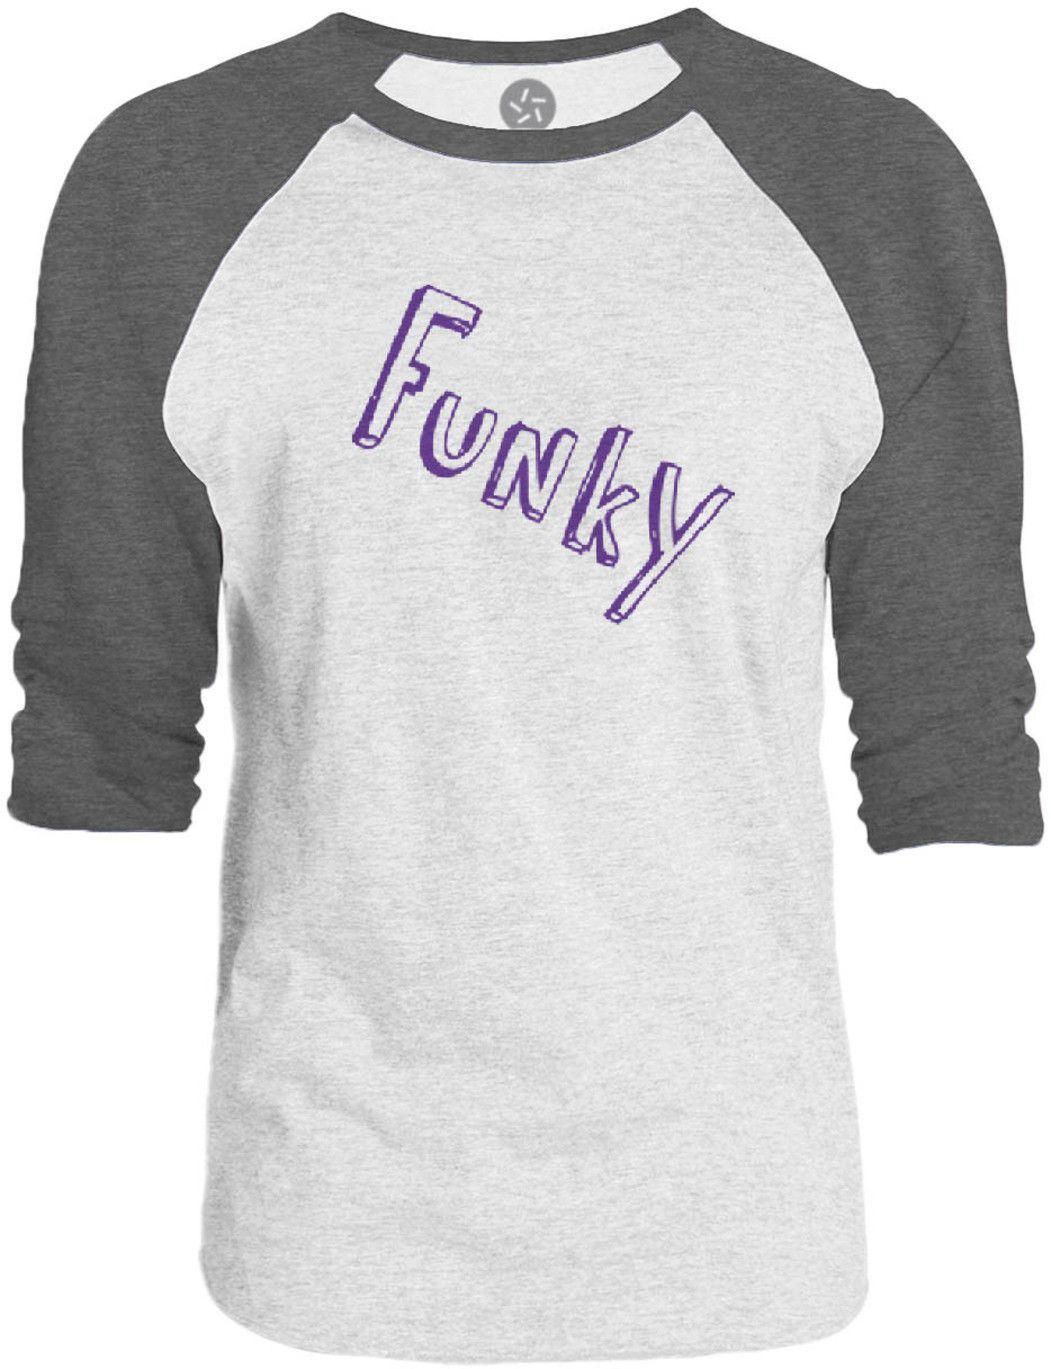 Big Texas Funky (Purple) 3/4-Sleeve Raglan Baseball T-Shirt